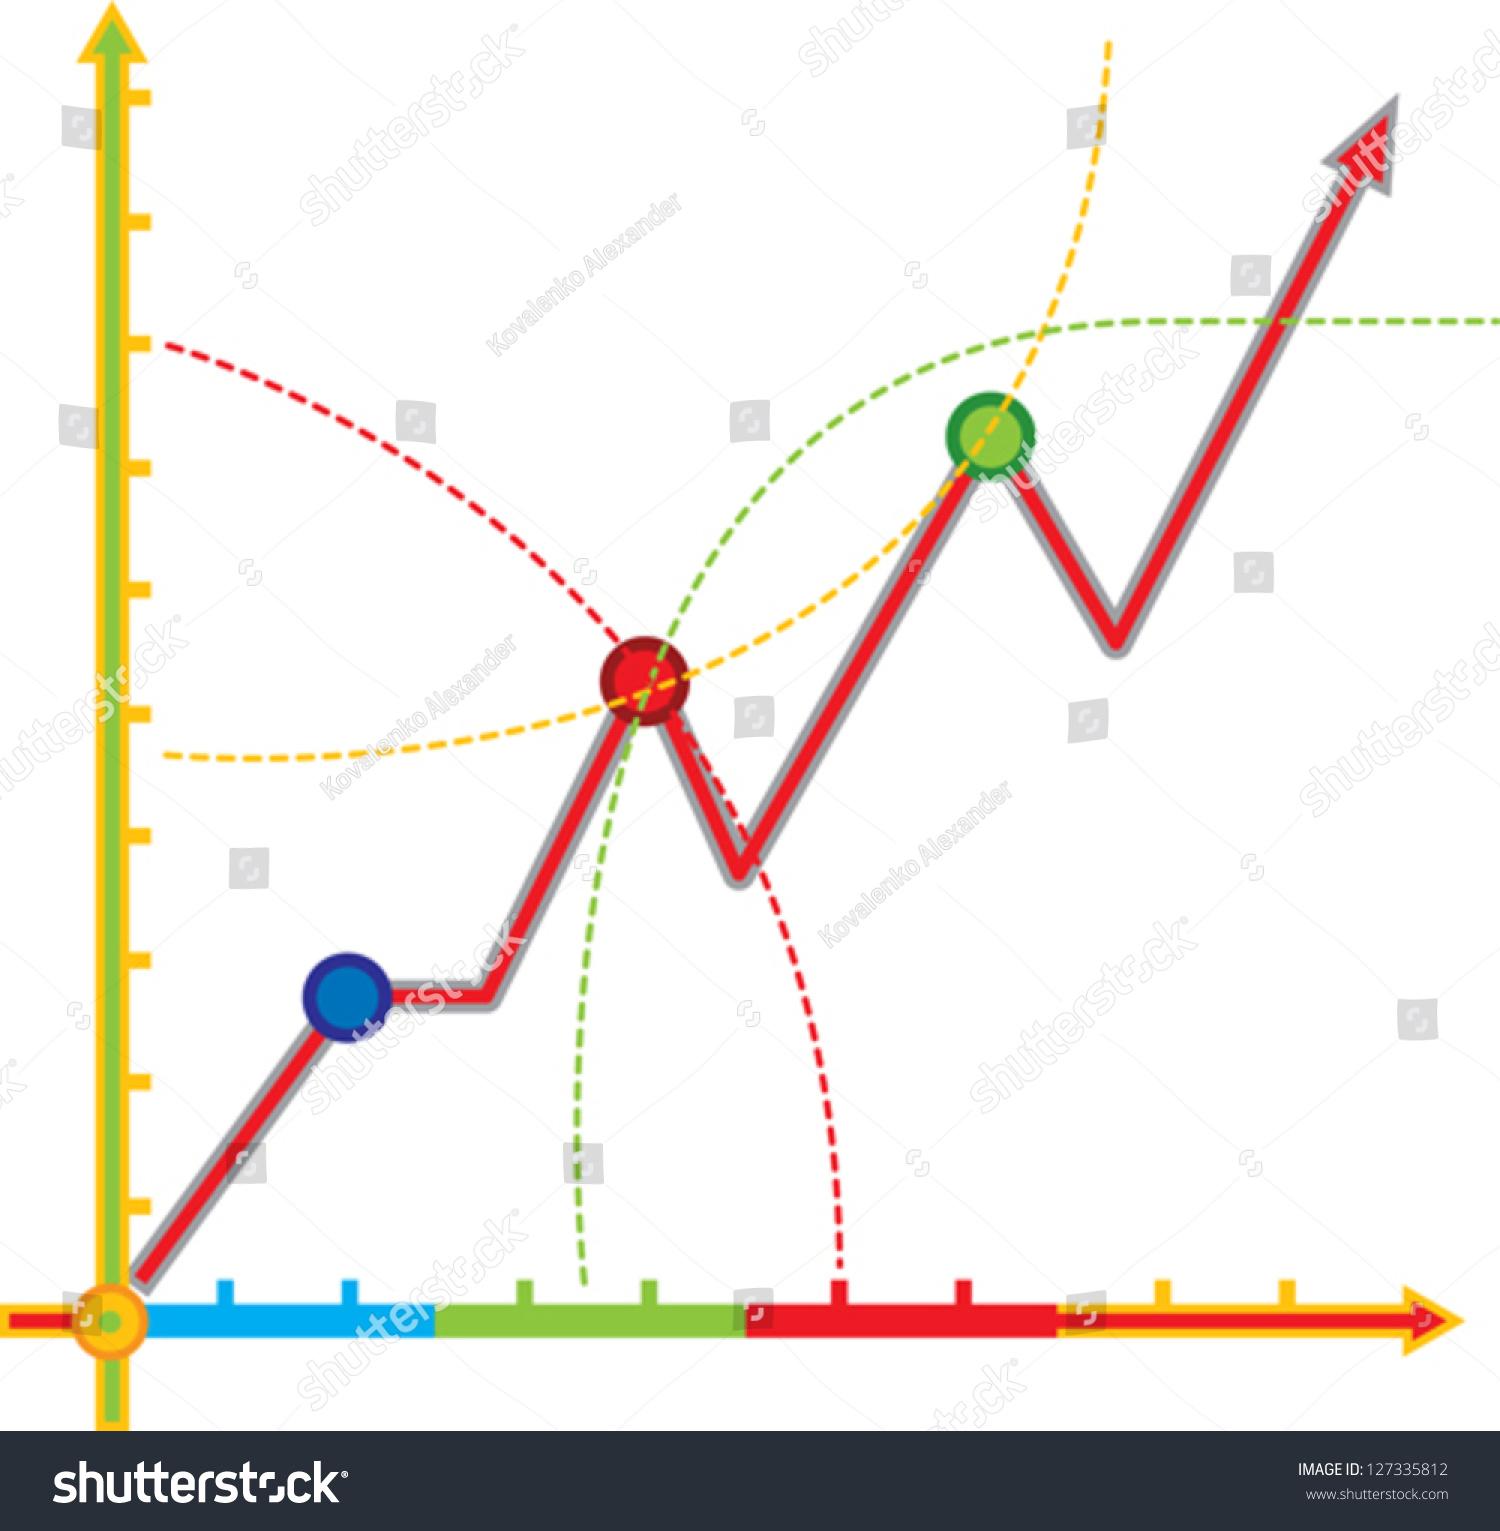 Mathematics chart growth curve stock vector 127335812 shutterstock mathematics chart the growth curve nvjuhfo Choice Image